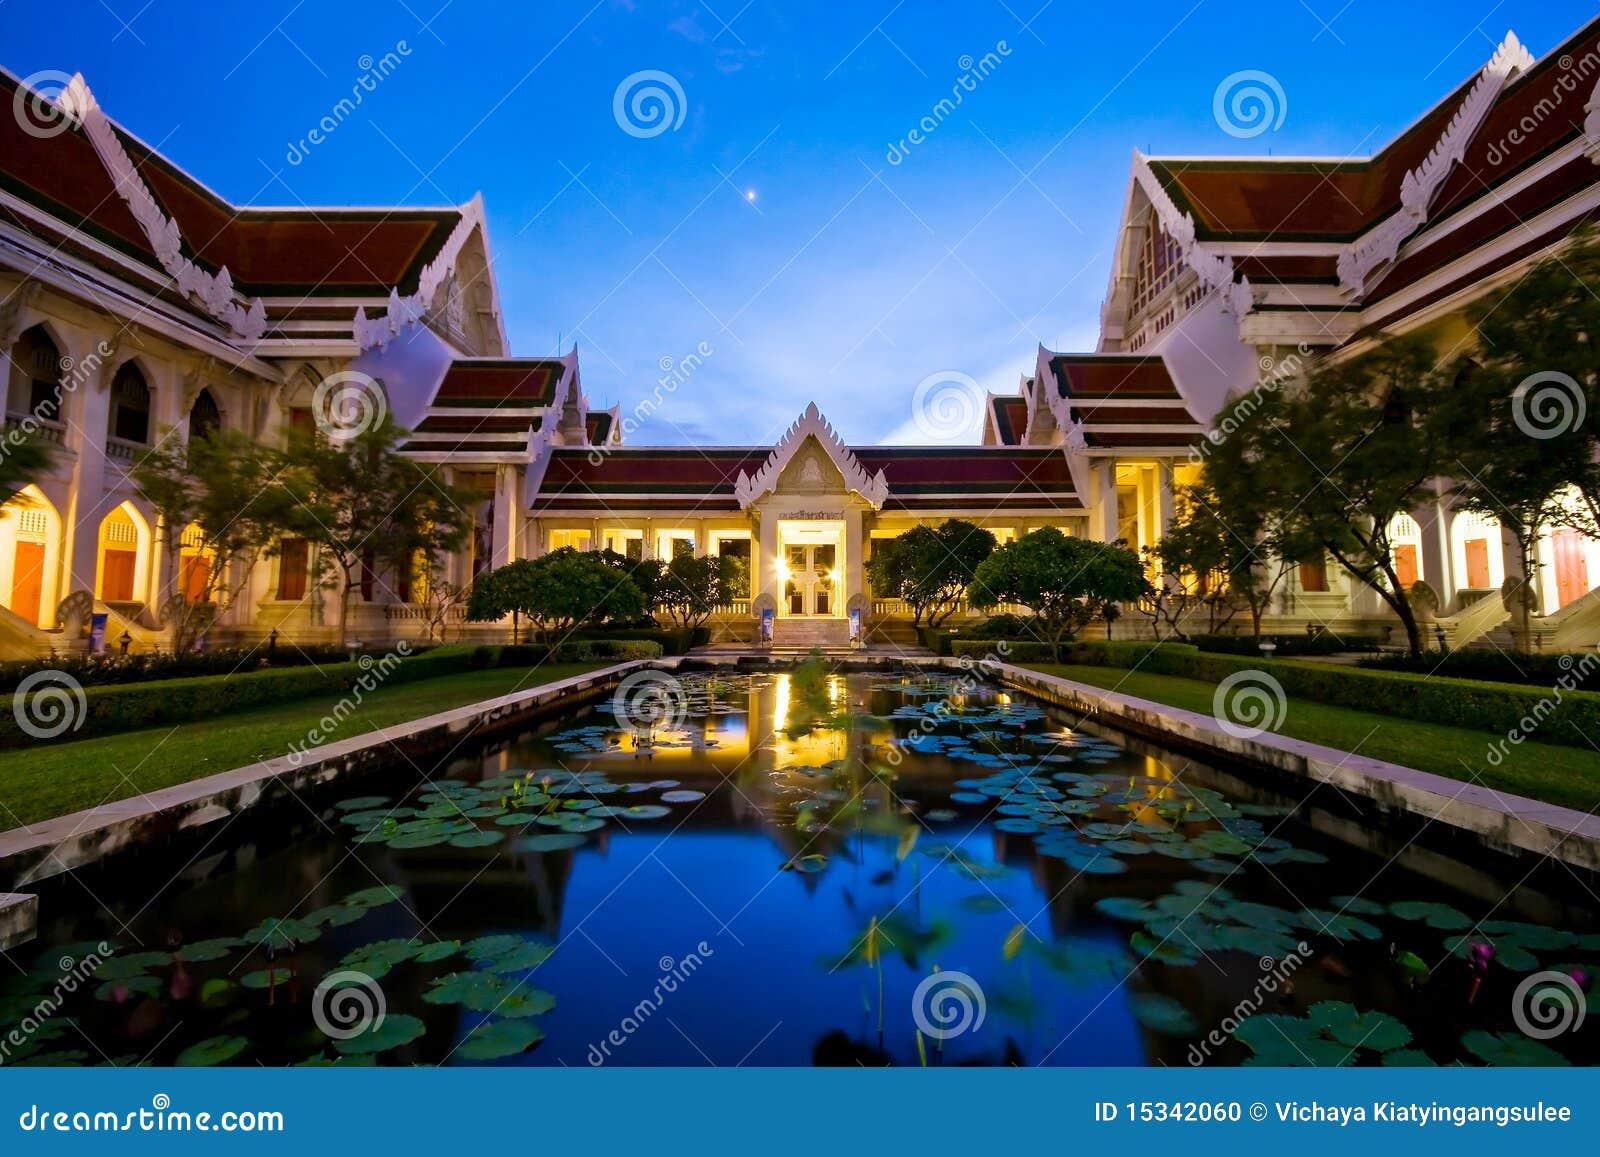 Dhevalai, Chulalongkorn Thailand Stock Photo - Image: 15342060